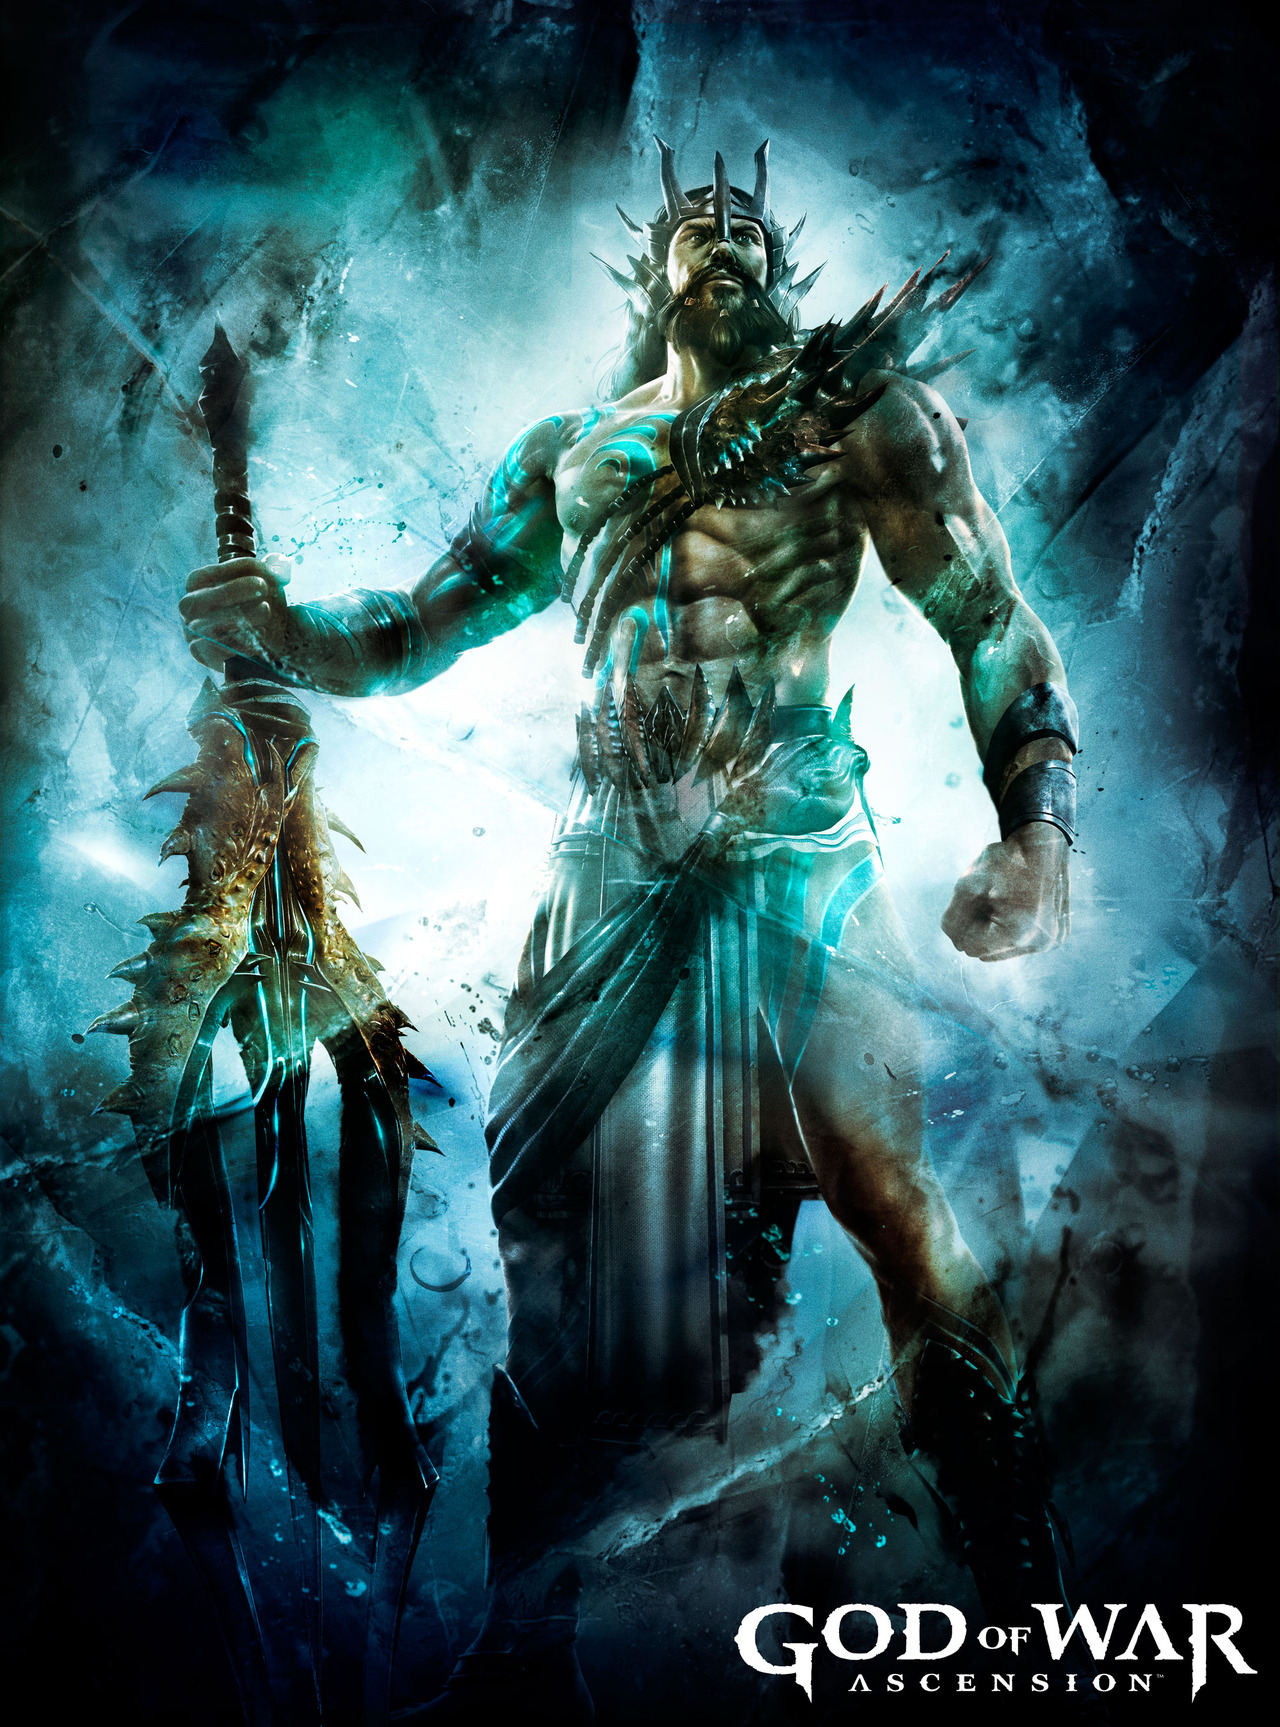 God of War Ascension 06-03-13 Poseidon